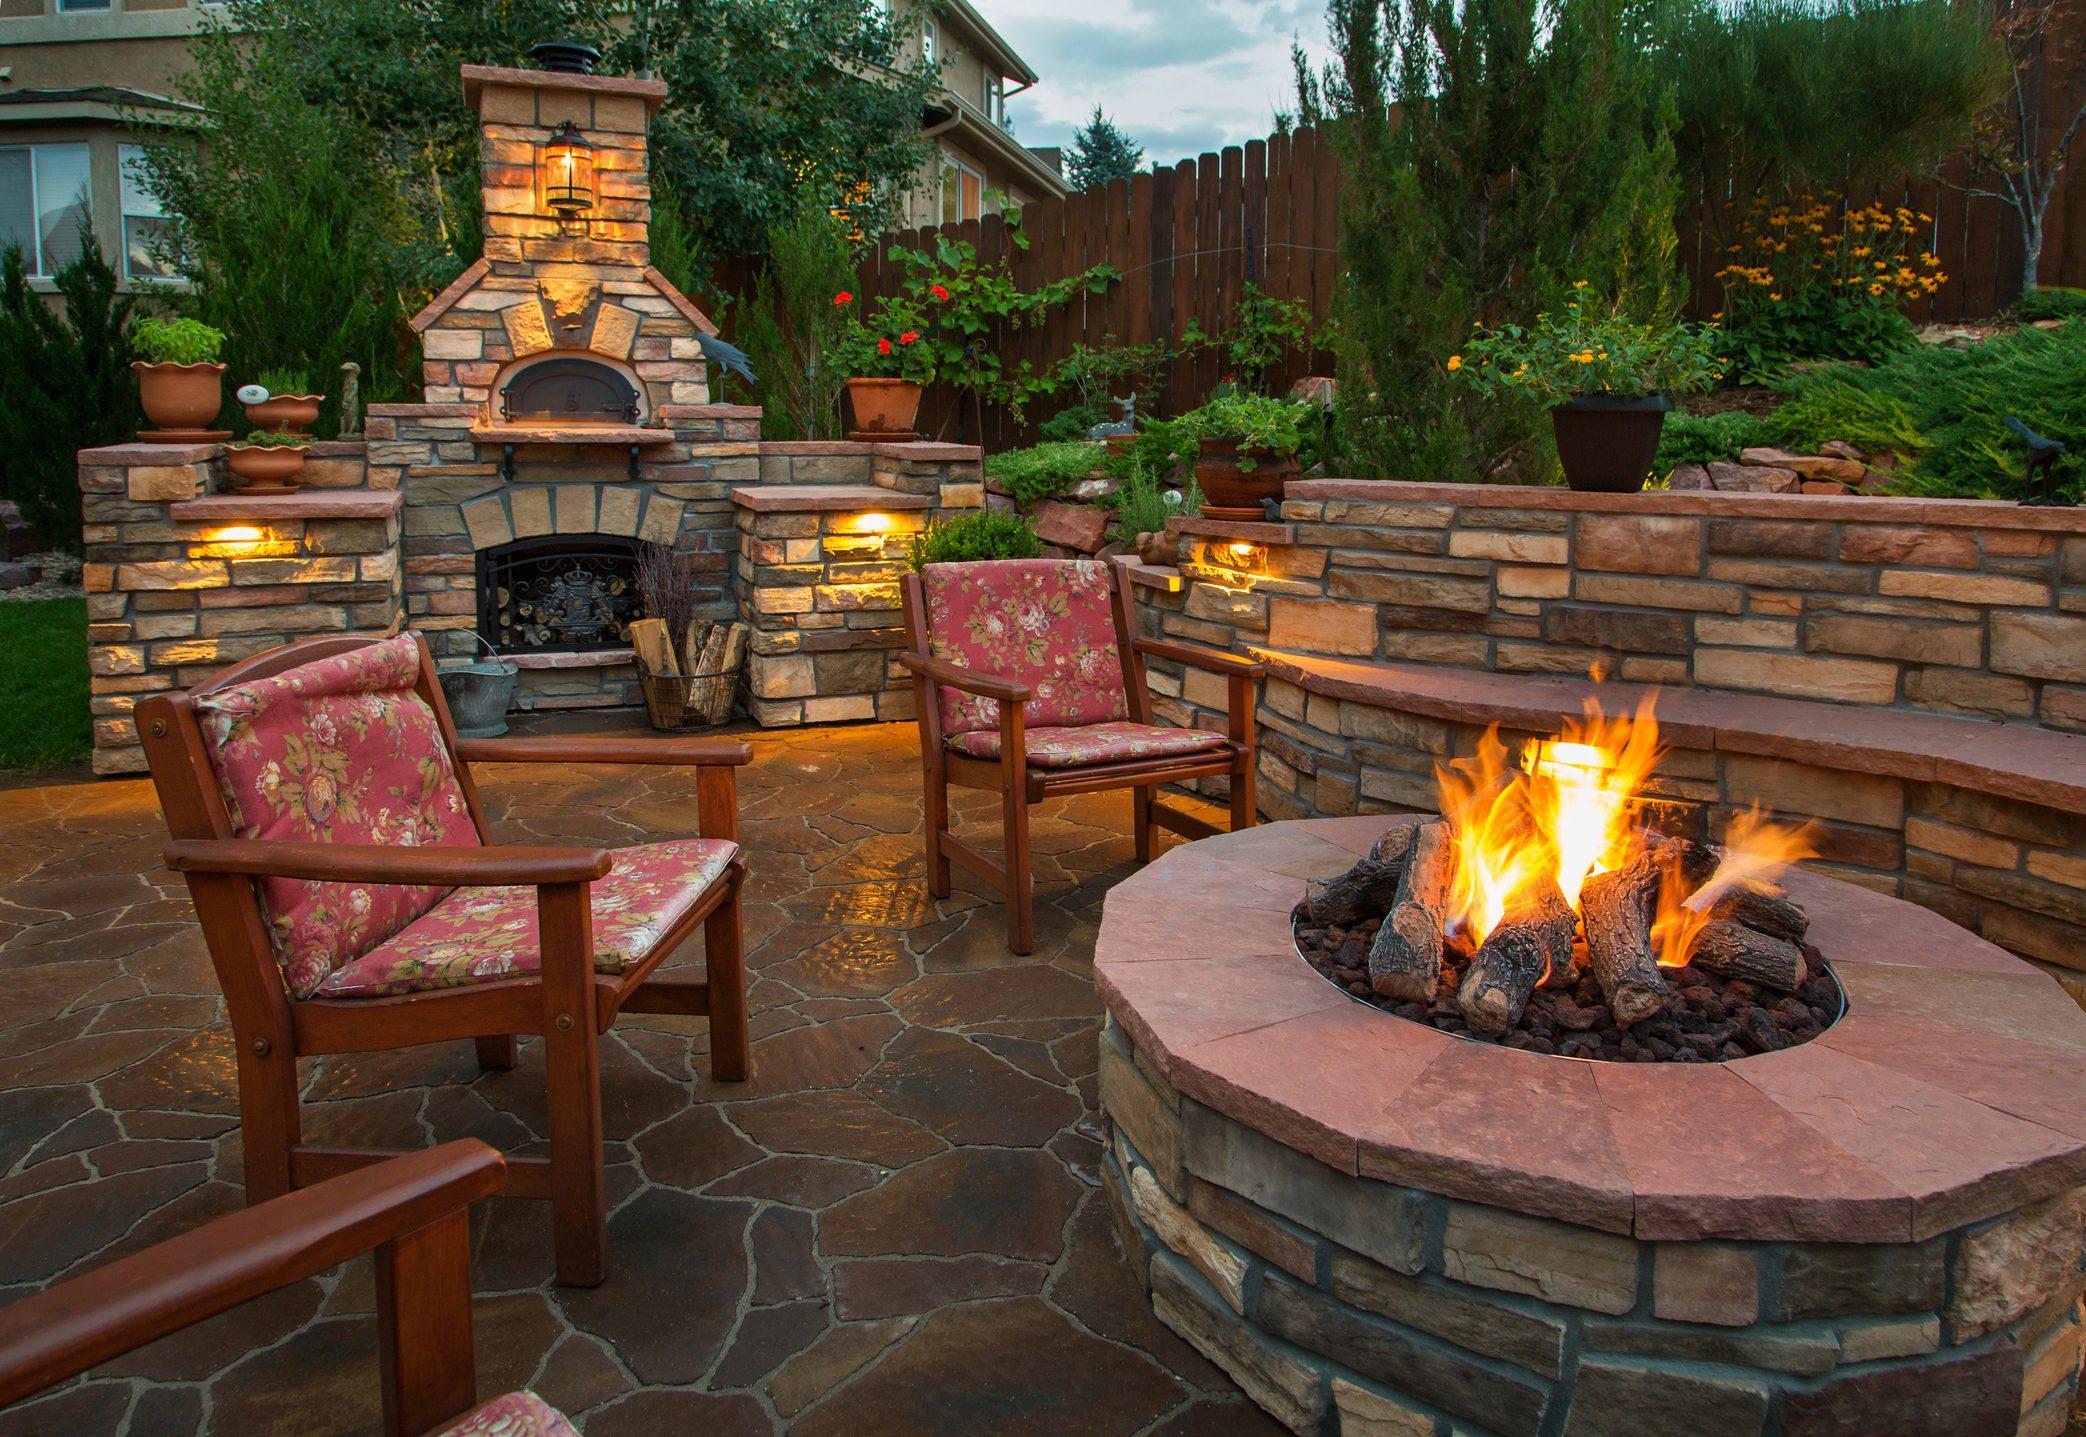 Backyard Firepits Are Trending